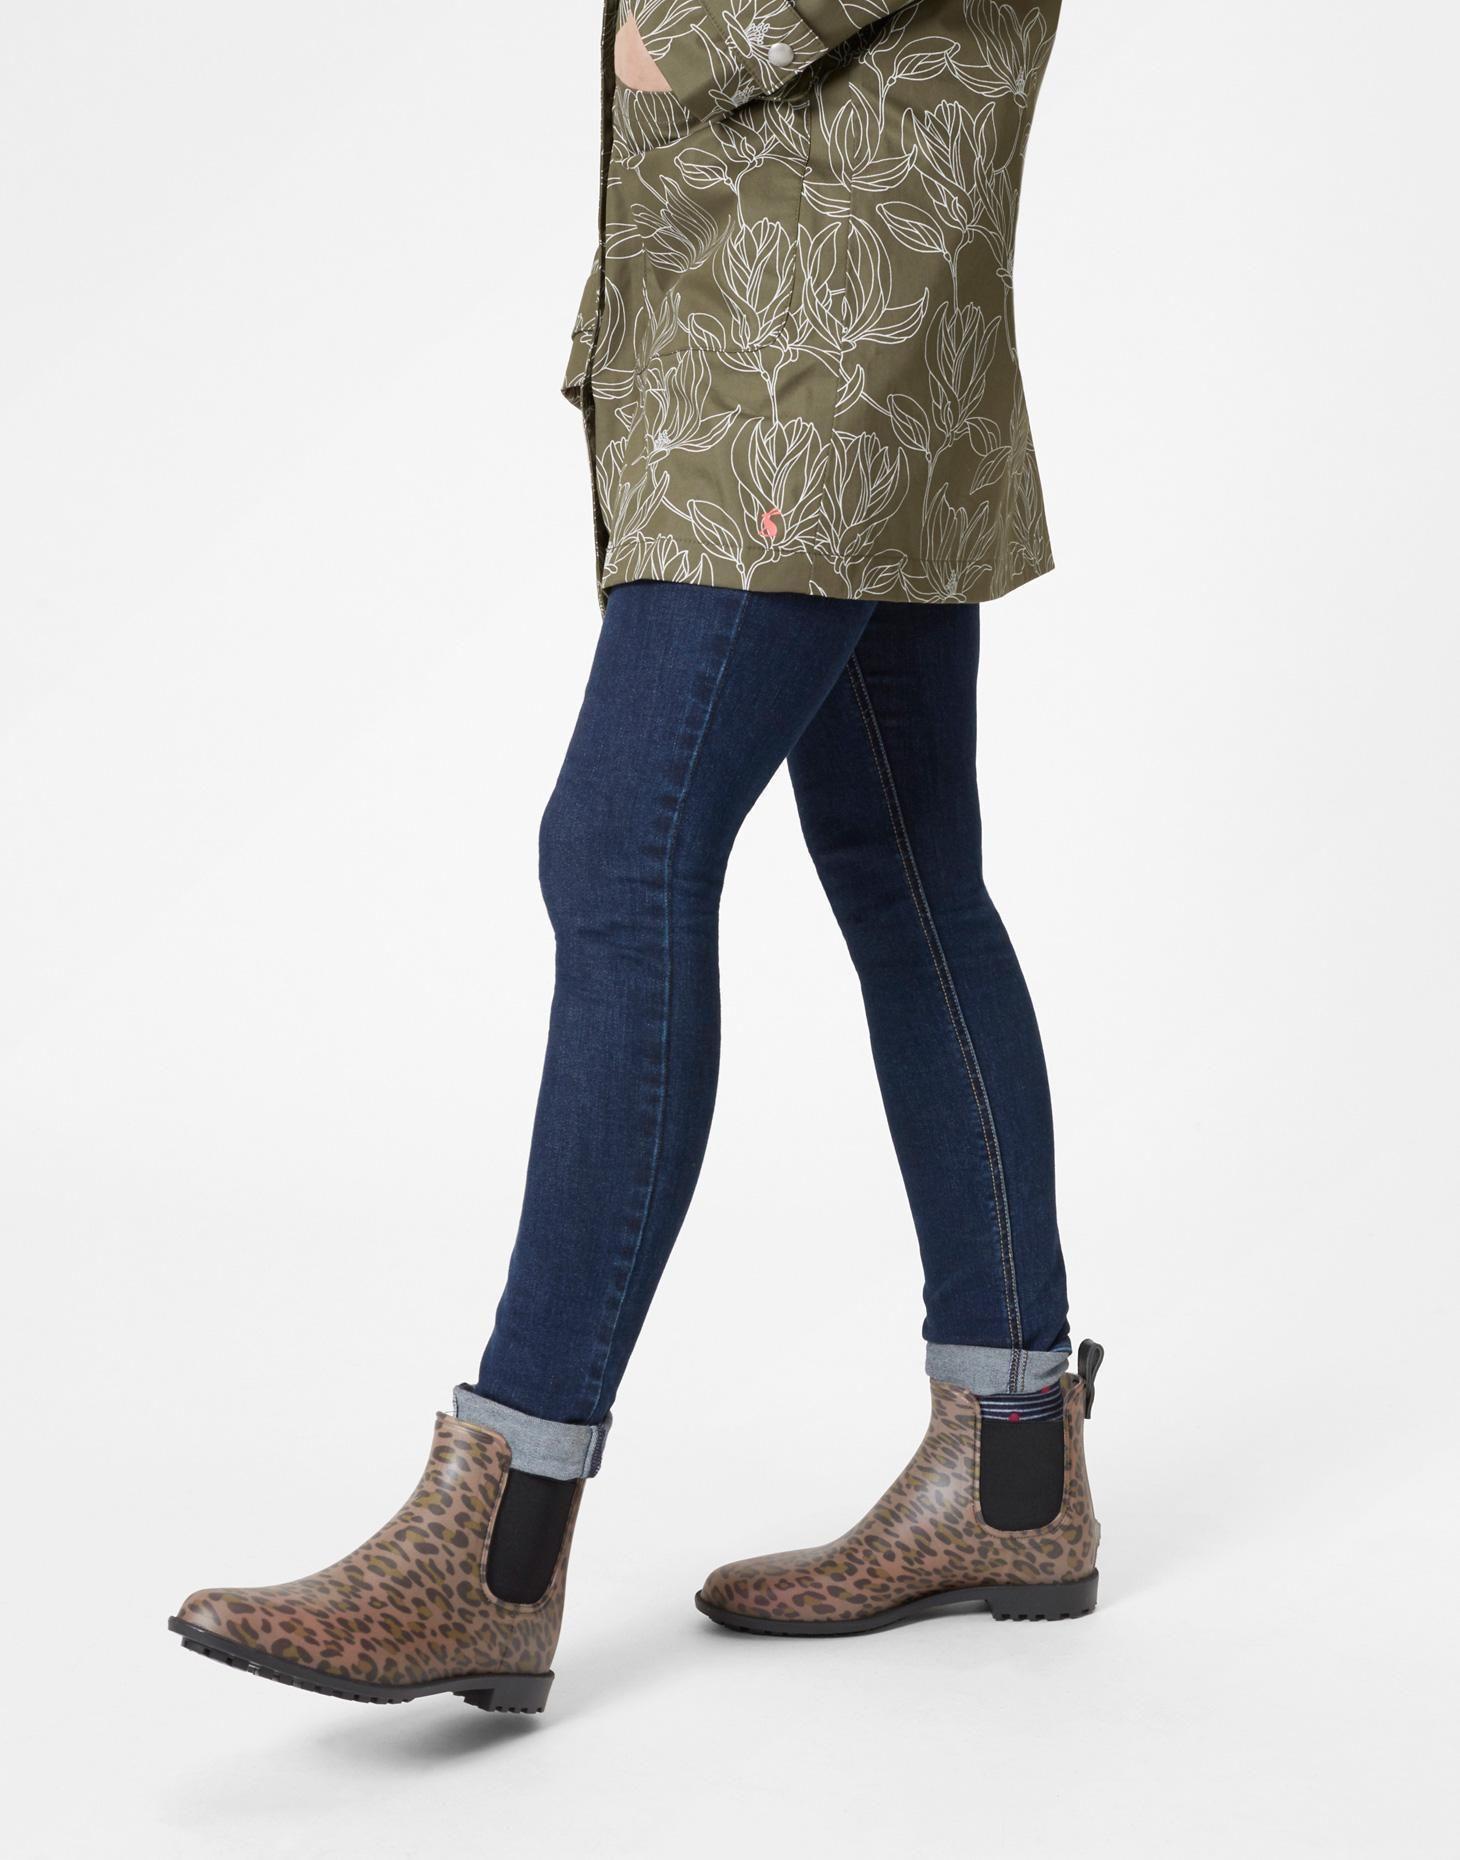 Rockingham Chelsea Boots | Chelsea